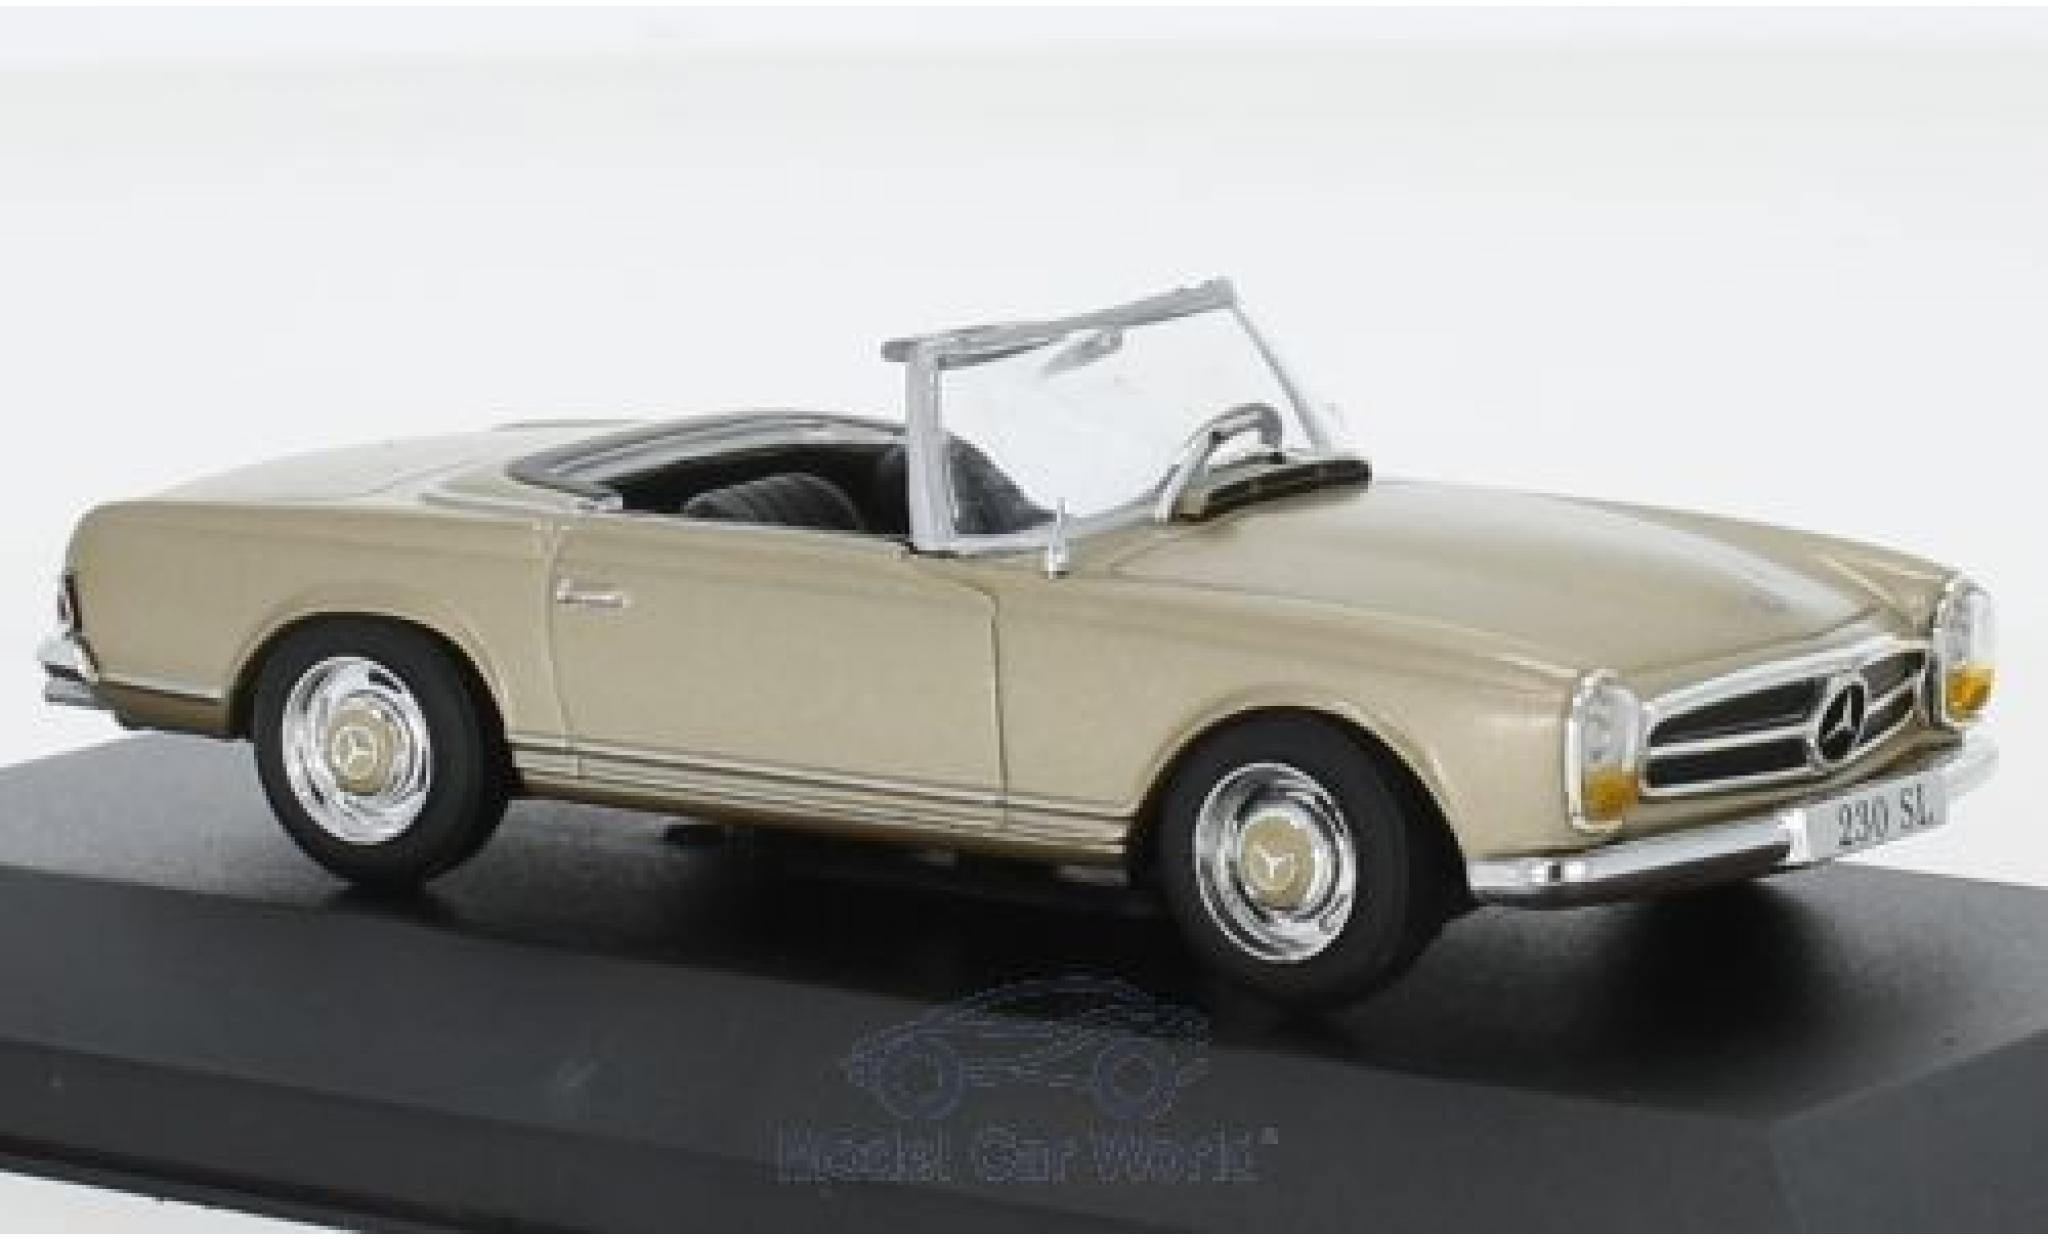 Mercedes 230 1/43 Pct SL (W113) metallise beige 1963